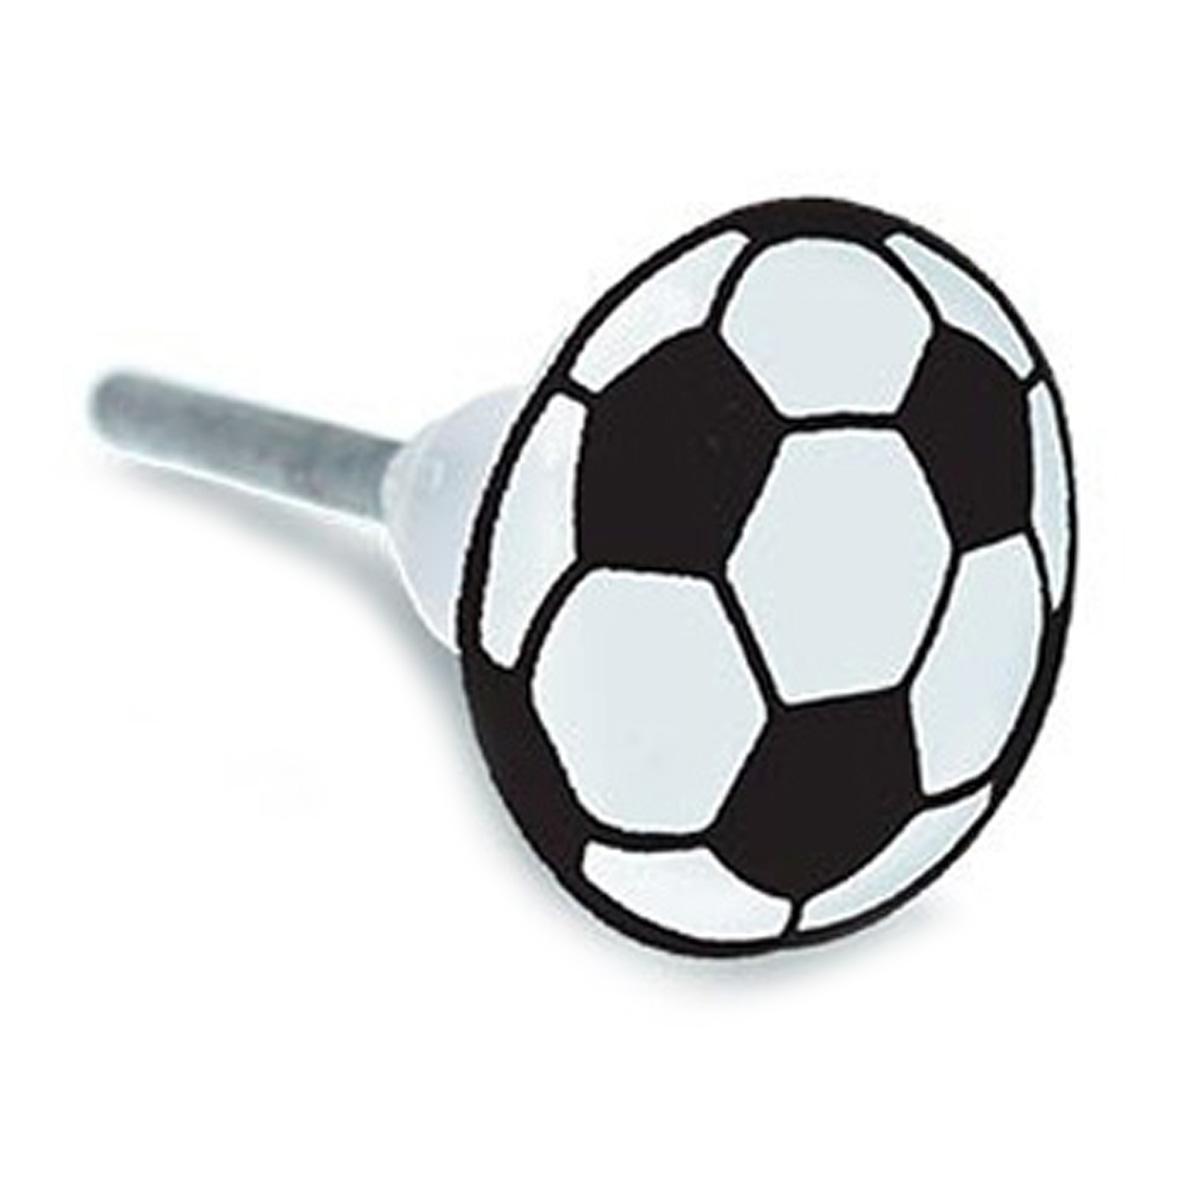 Bouton meuble céramique \'Football\' noir blanc - 65x35 mm - [A2187]